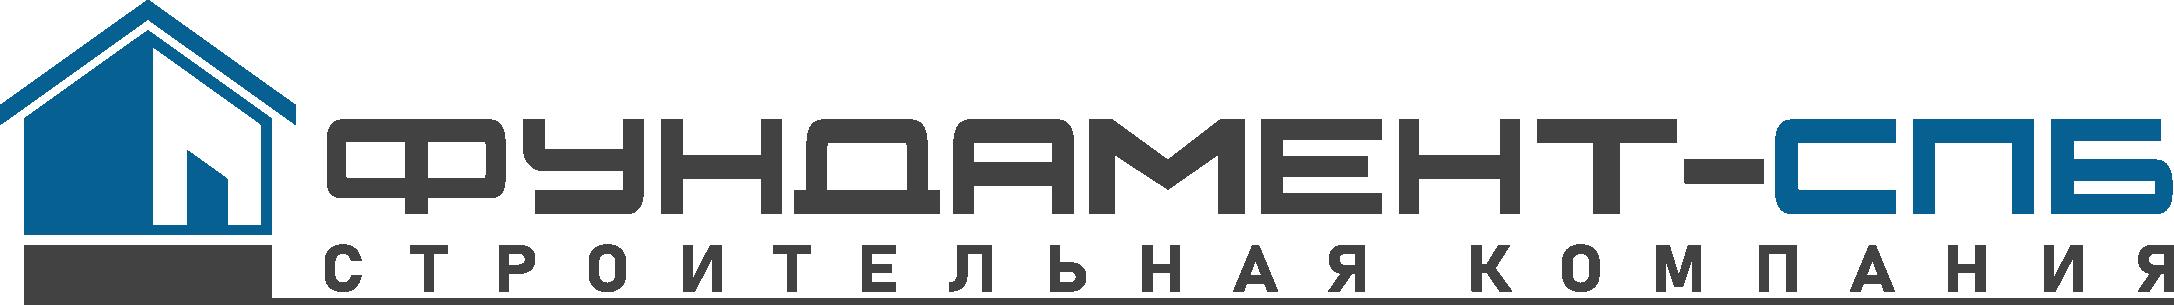 fundament_logo